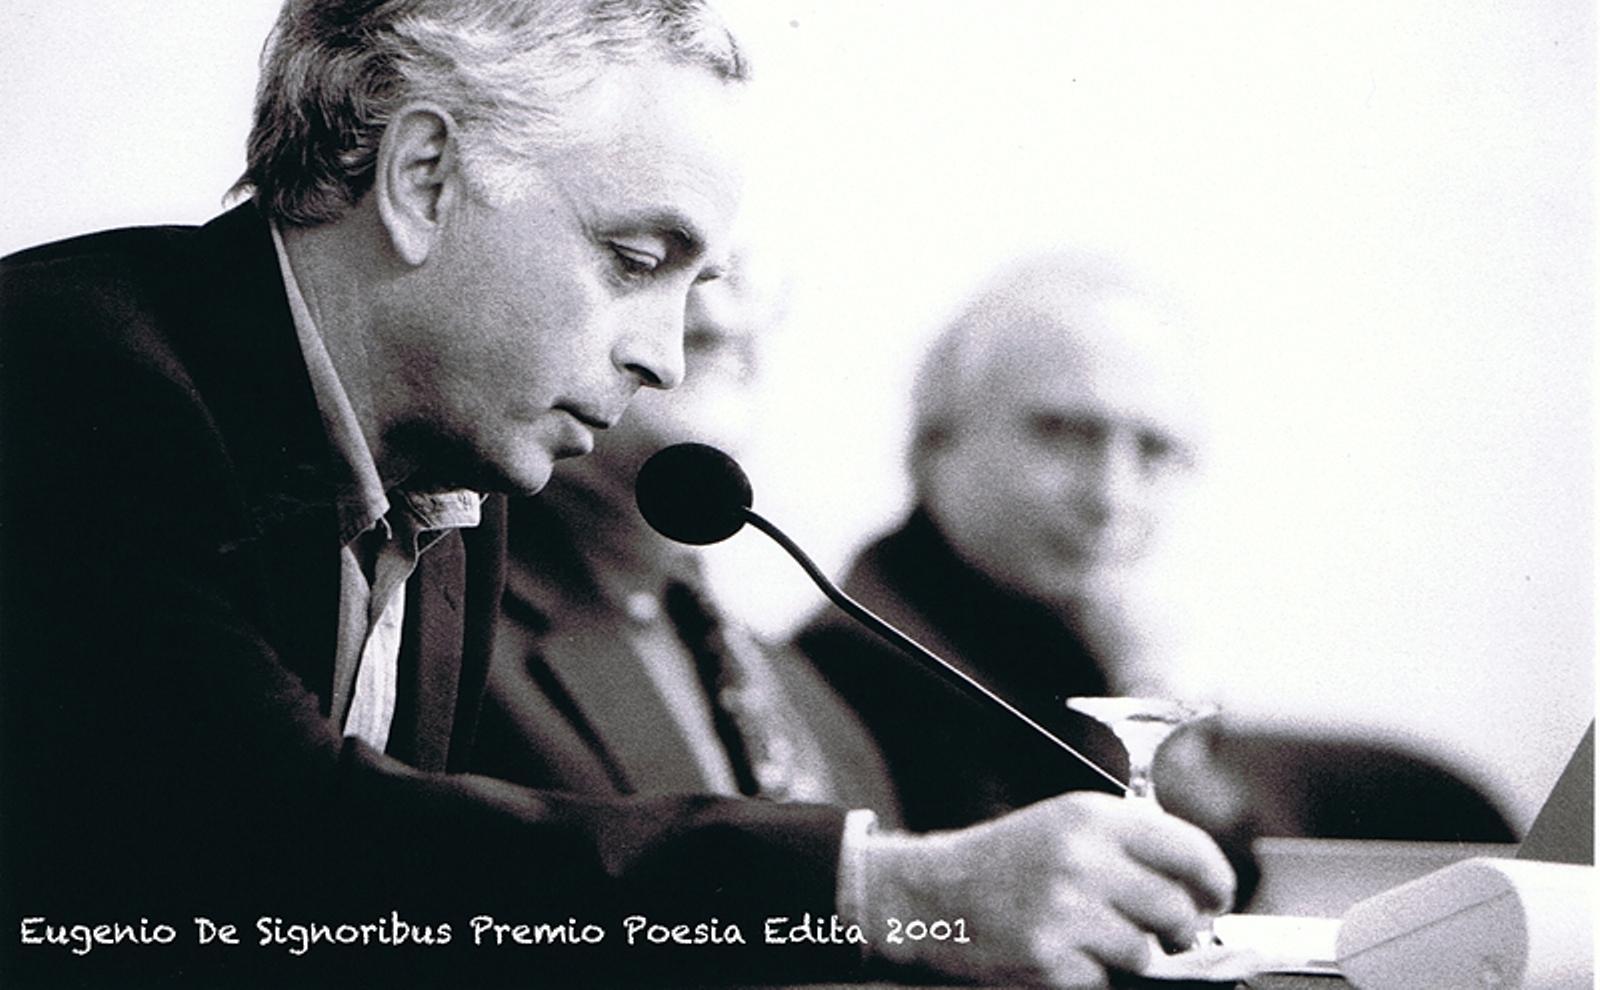 eugenio-de-signoribus-premio-poesia-edita-2001